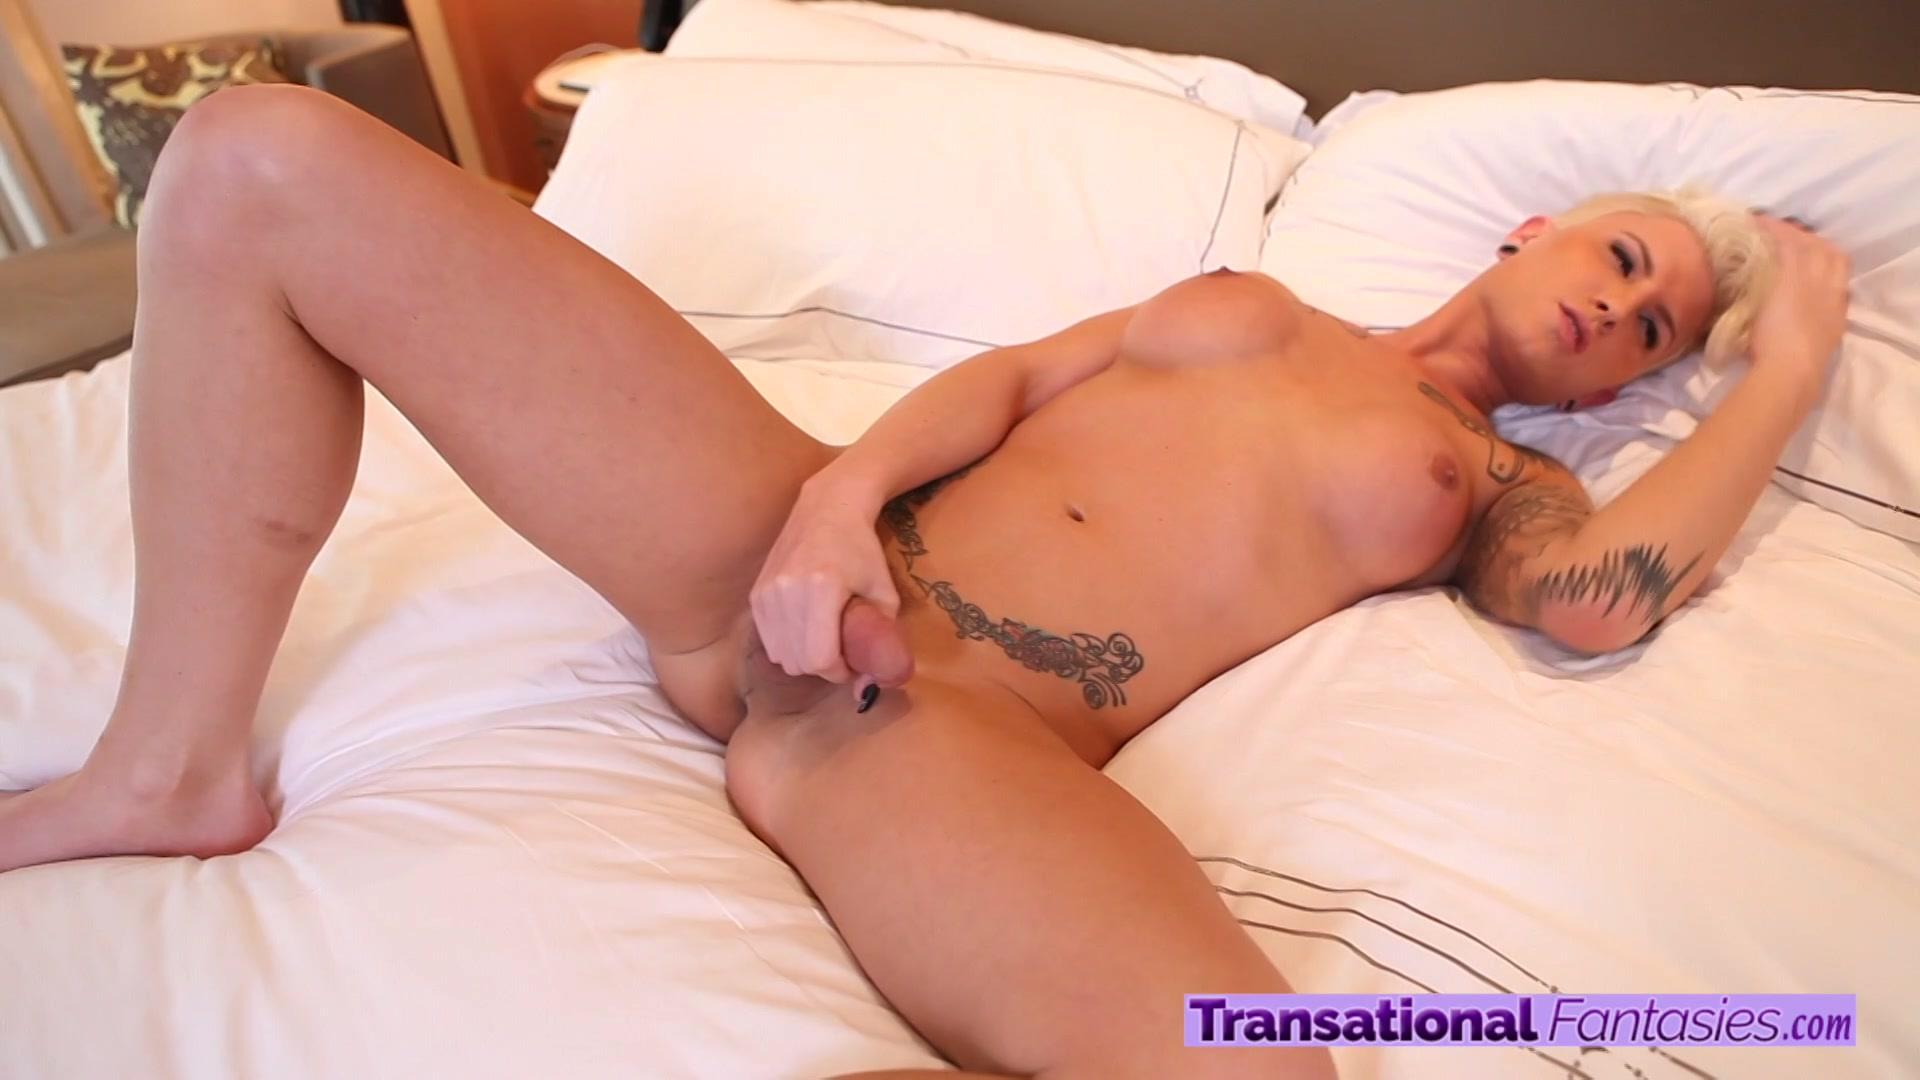 Danni Xxx Danni Daniels Summer Tranny Broadcast Sex Hq Pics